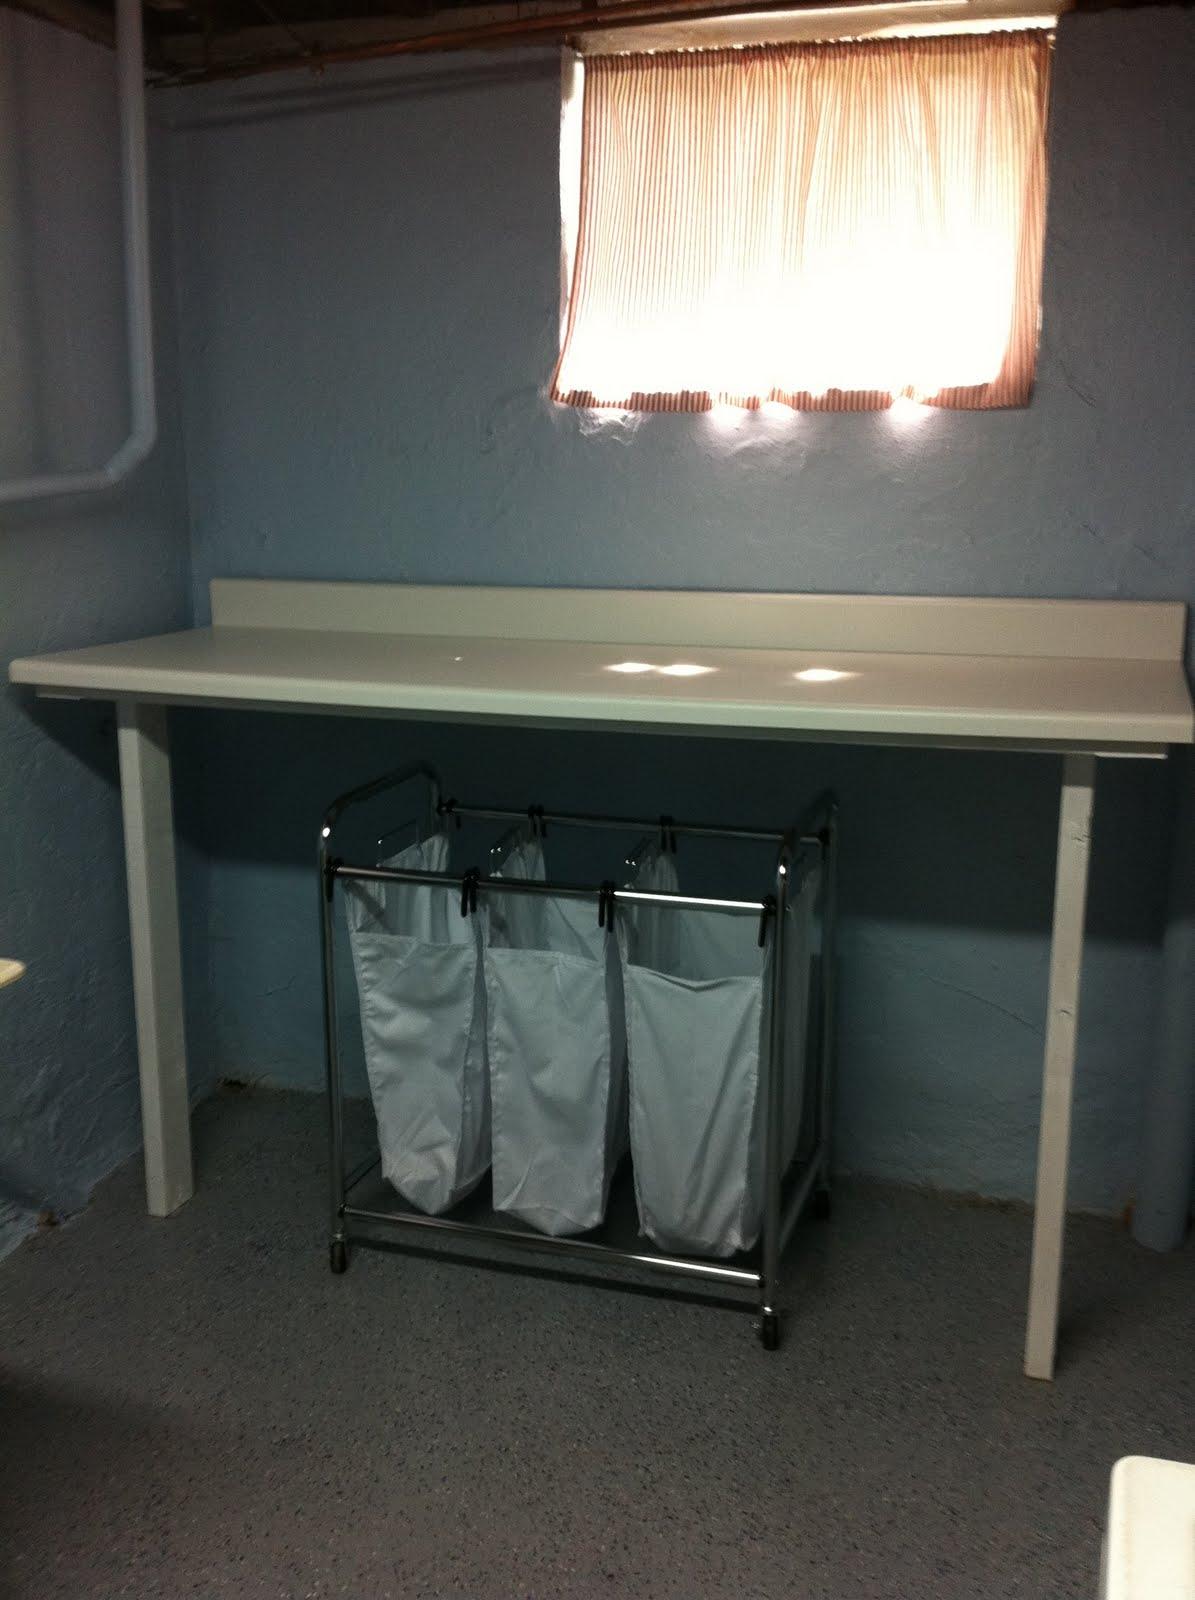 deMars Life on the East Coast Laundry Room Facelift